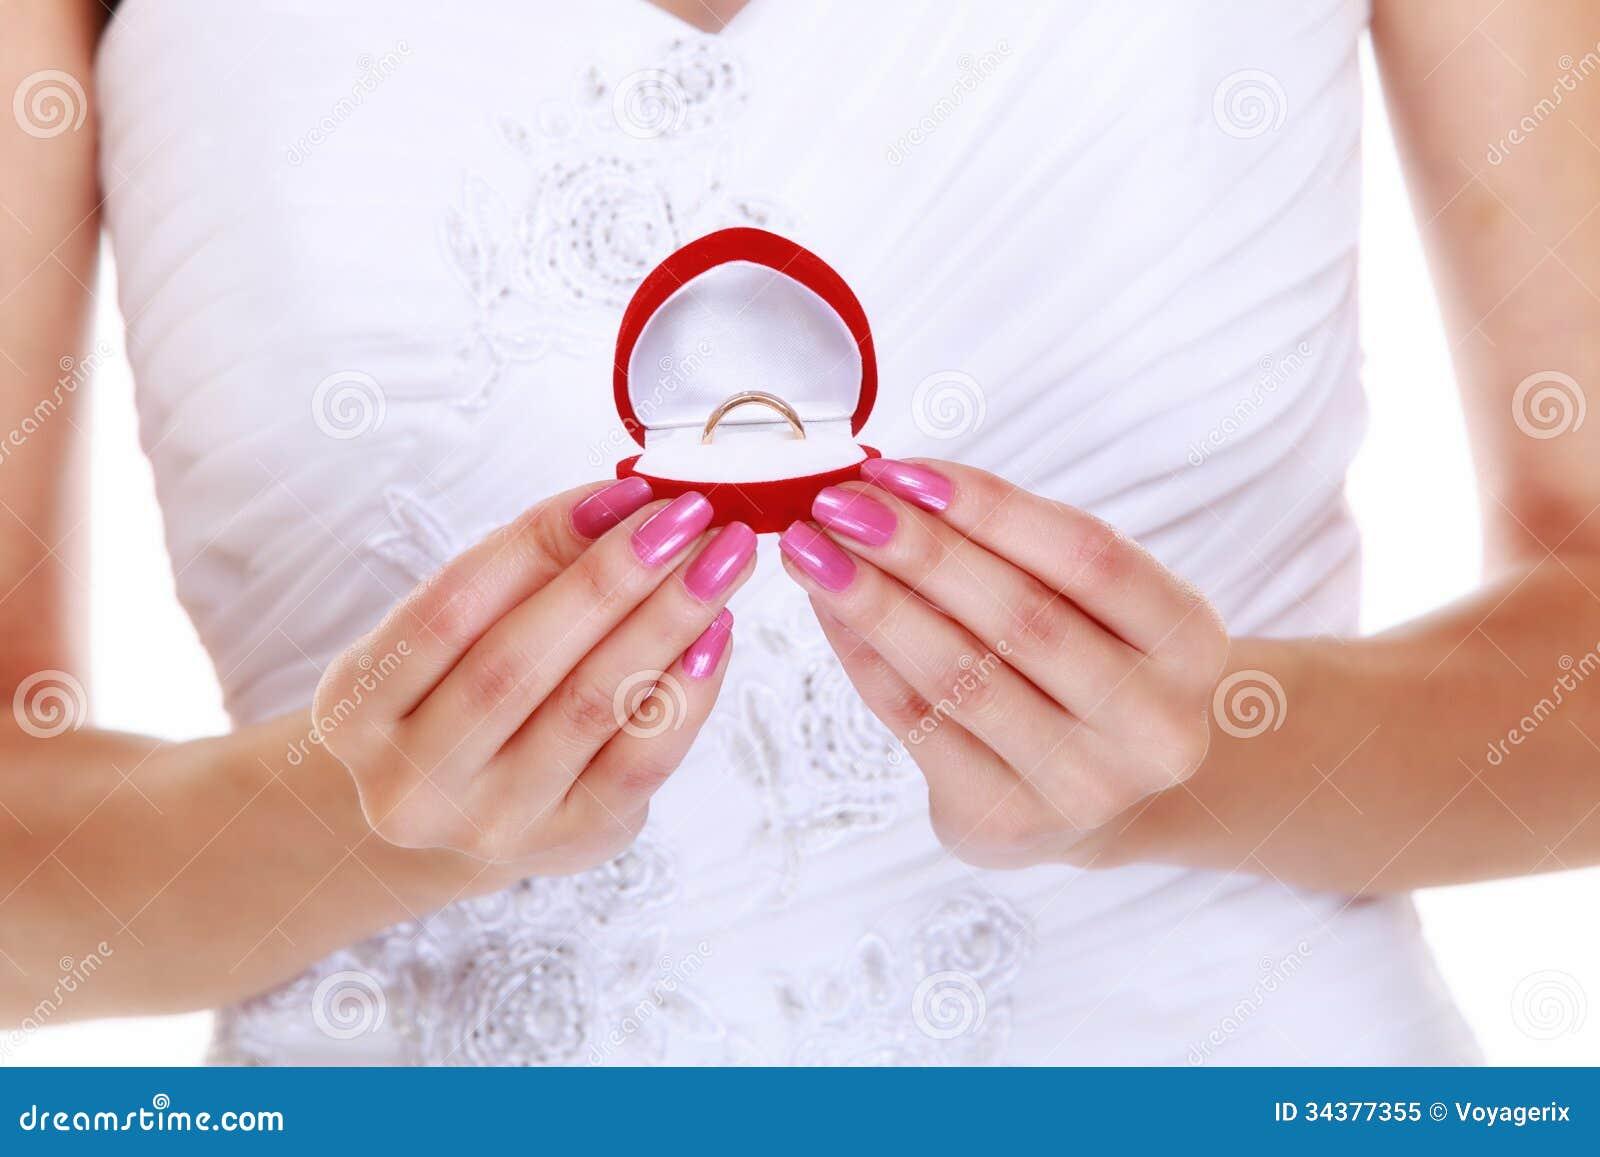 Girl Showing Engagement Or Wedding Ring, Isolated Stock Image ...